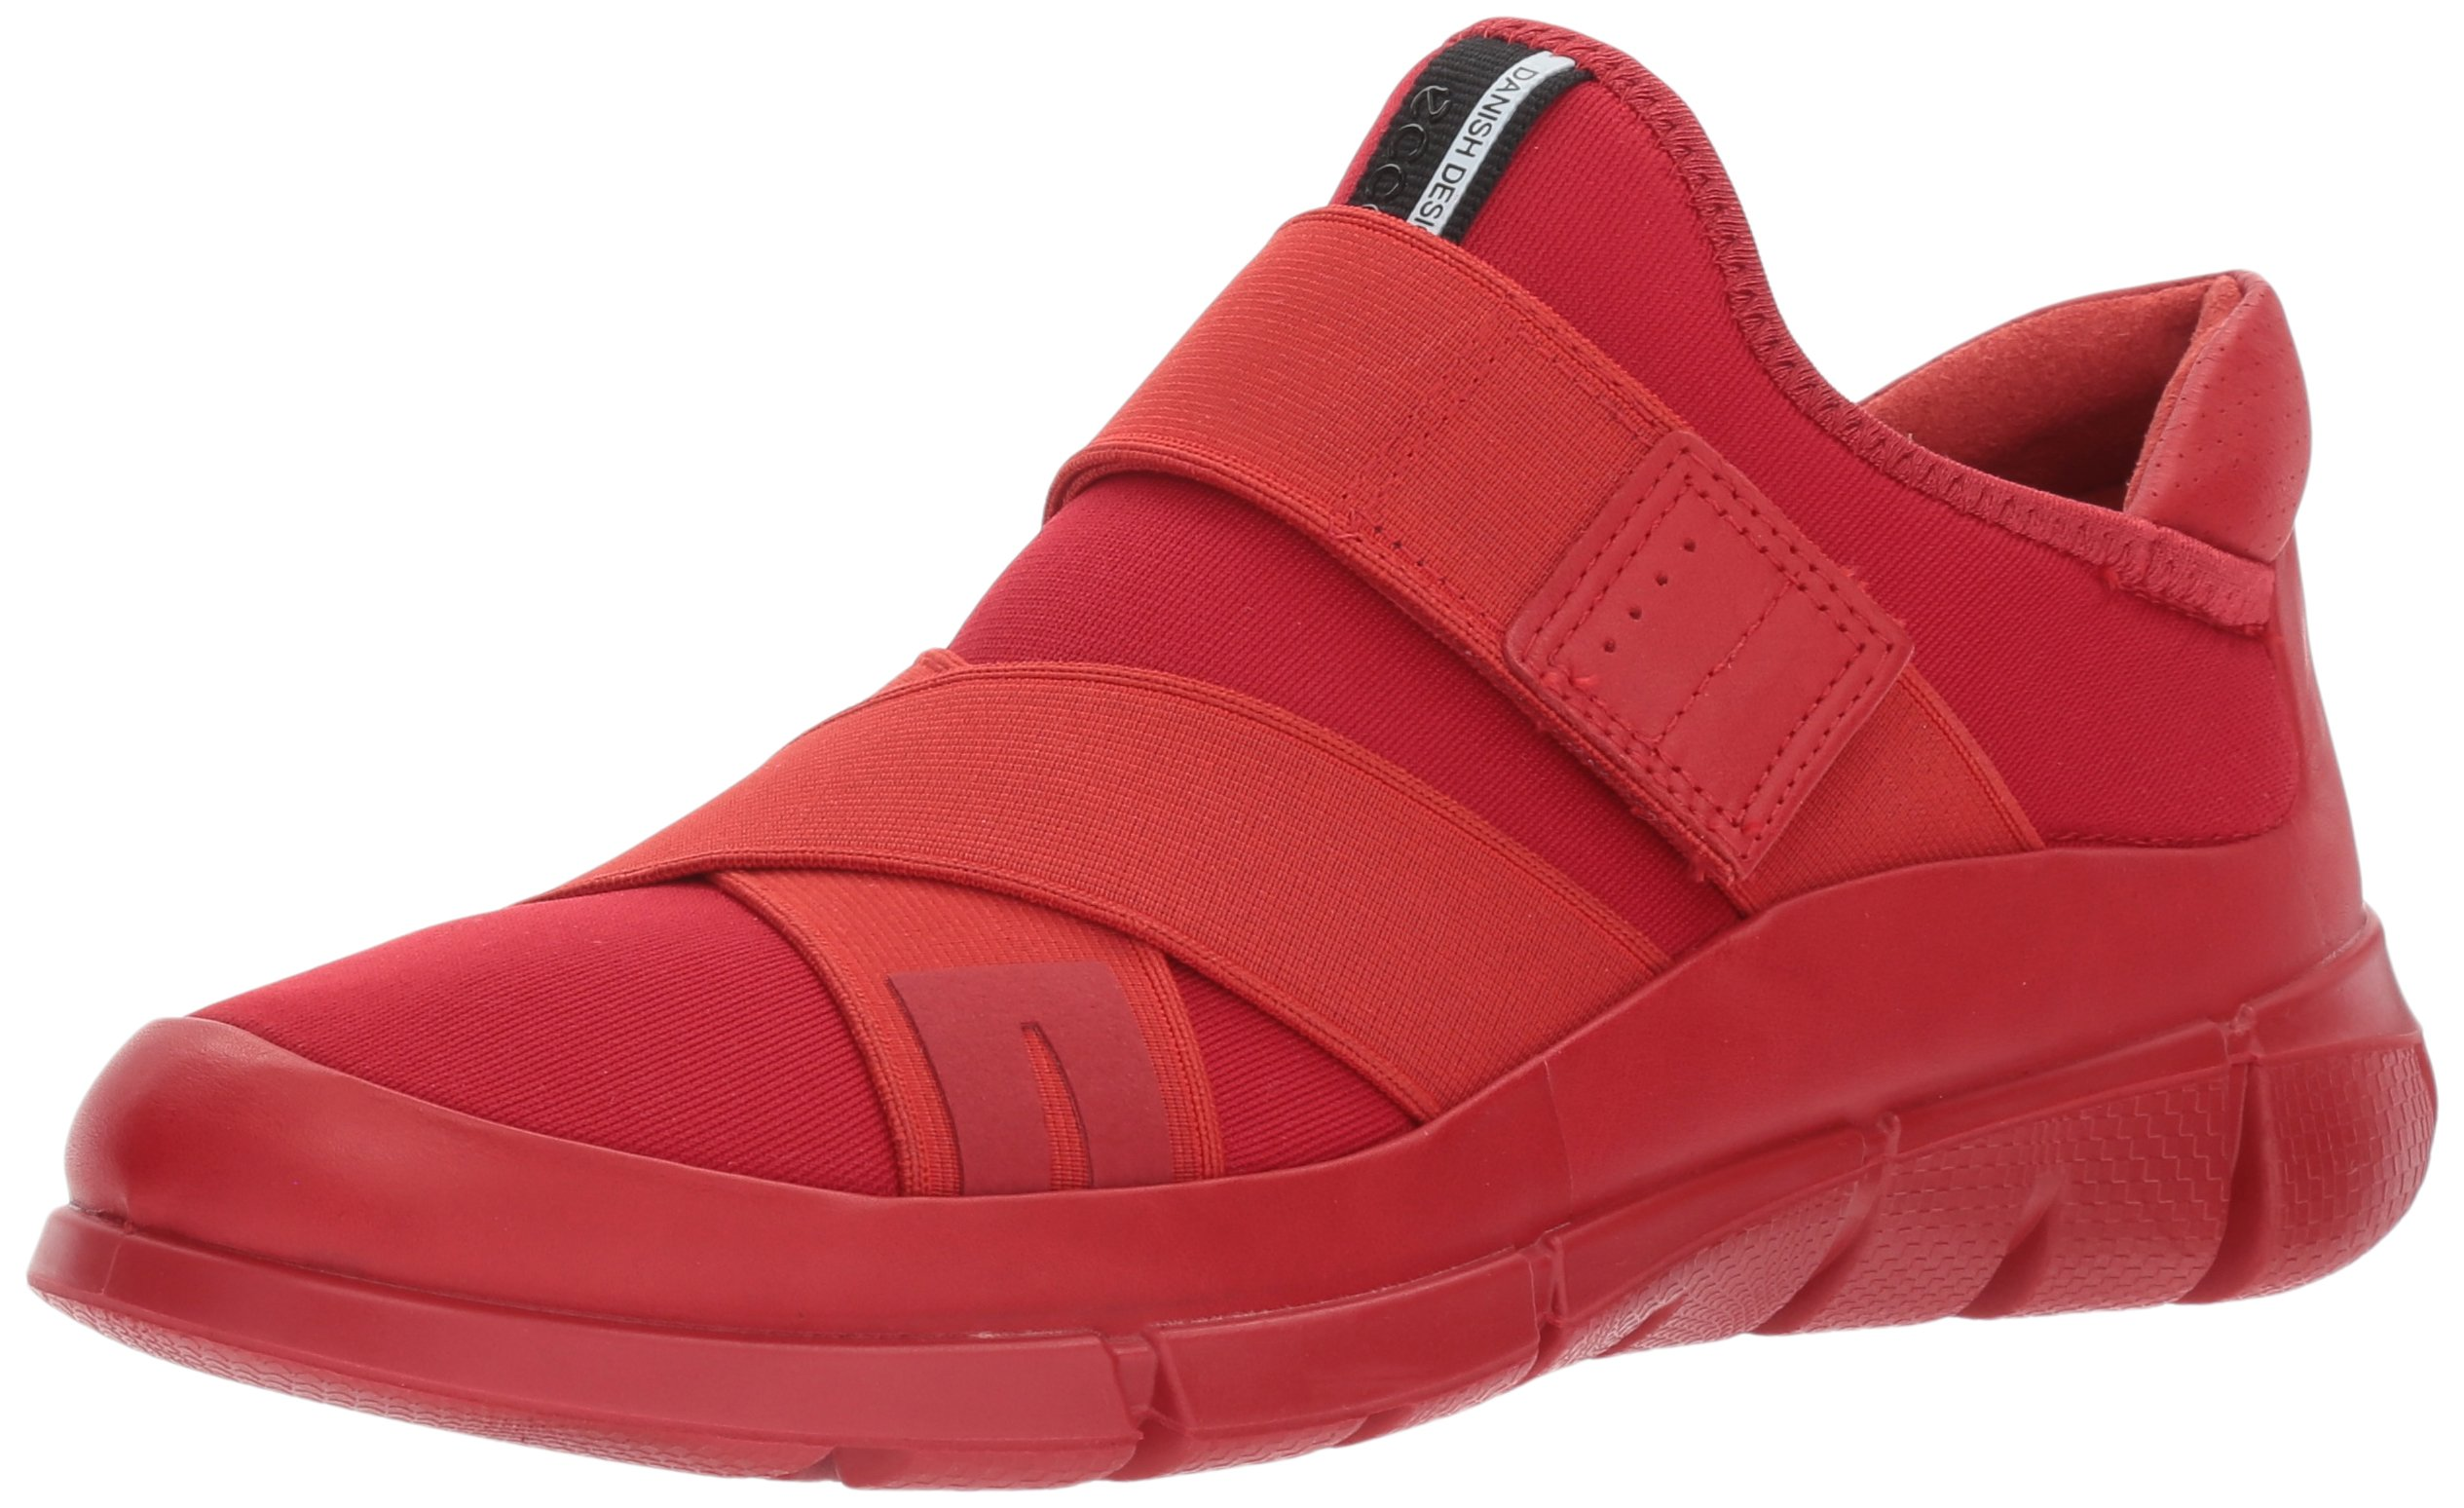 ECCO Women's Women's Intrinsic Elastic Slip on Fashion Sneaker, Tomato/Tomato, 35 EU / 4-4.5 US